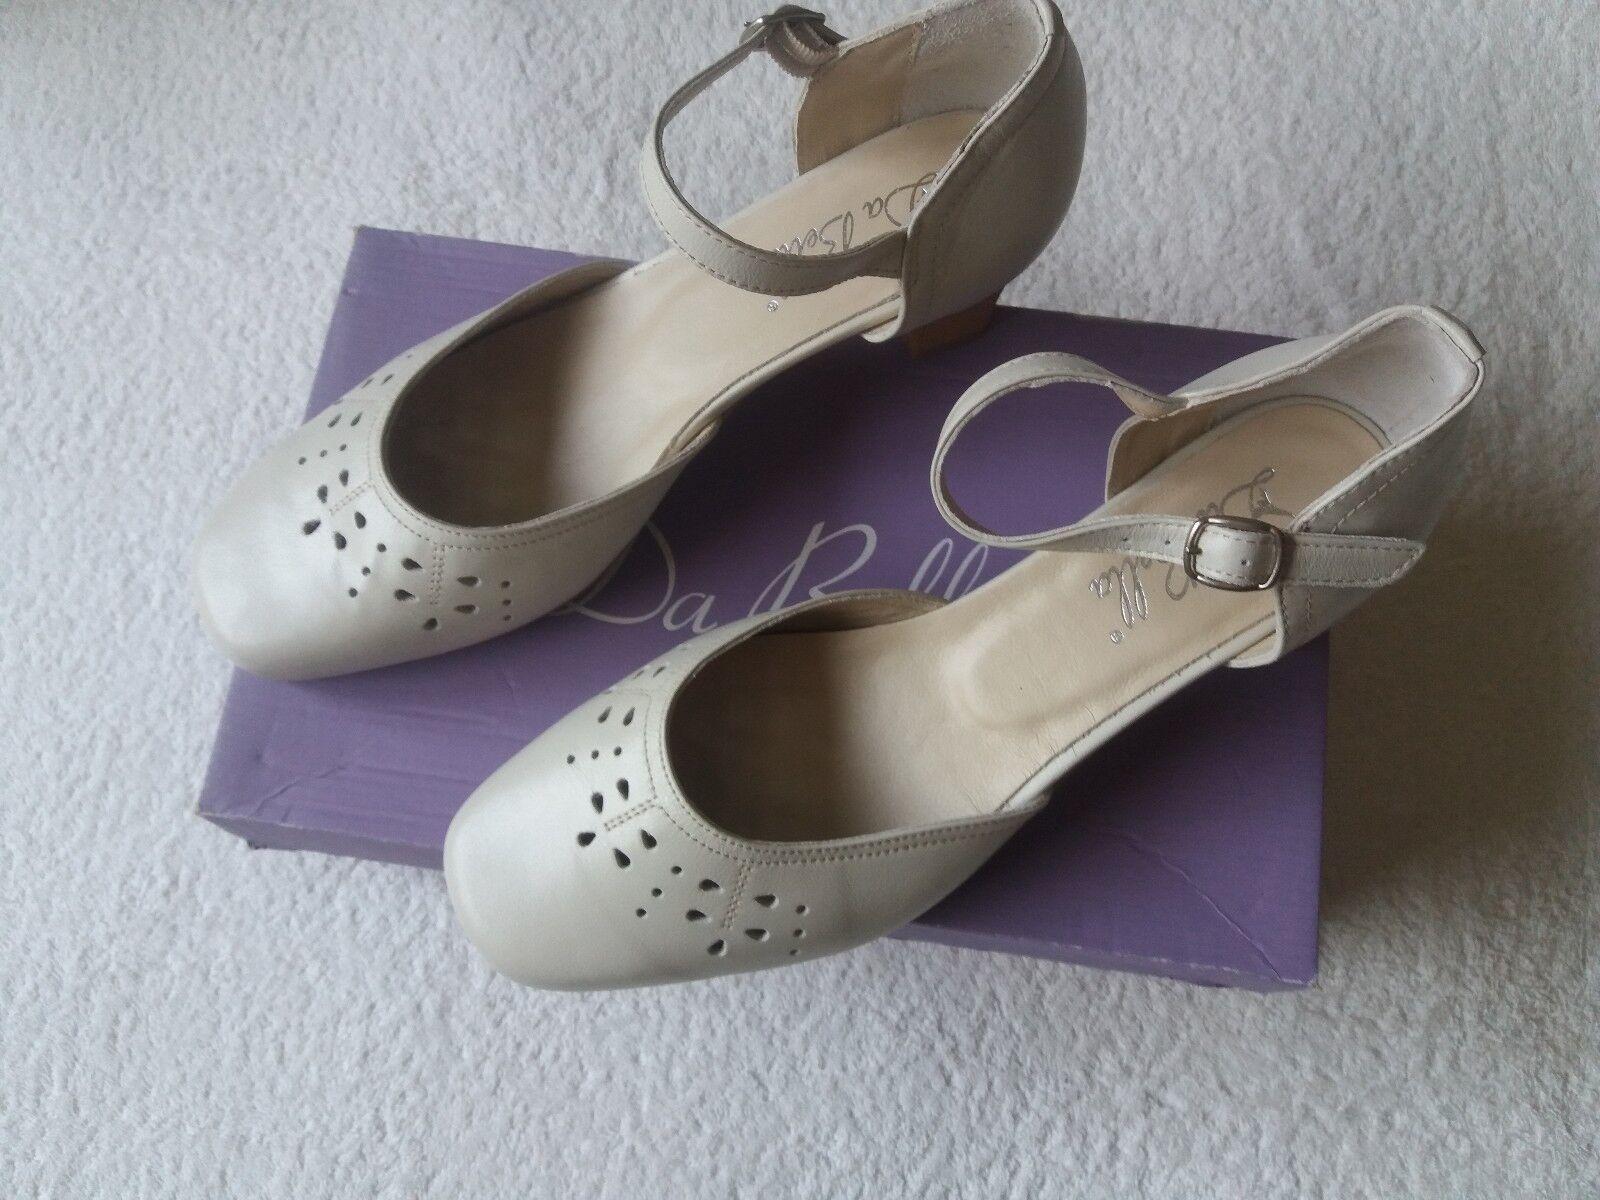 Brand New Women's Da Bella Sandals UK Size 6 EE